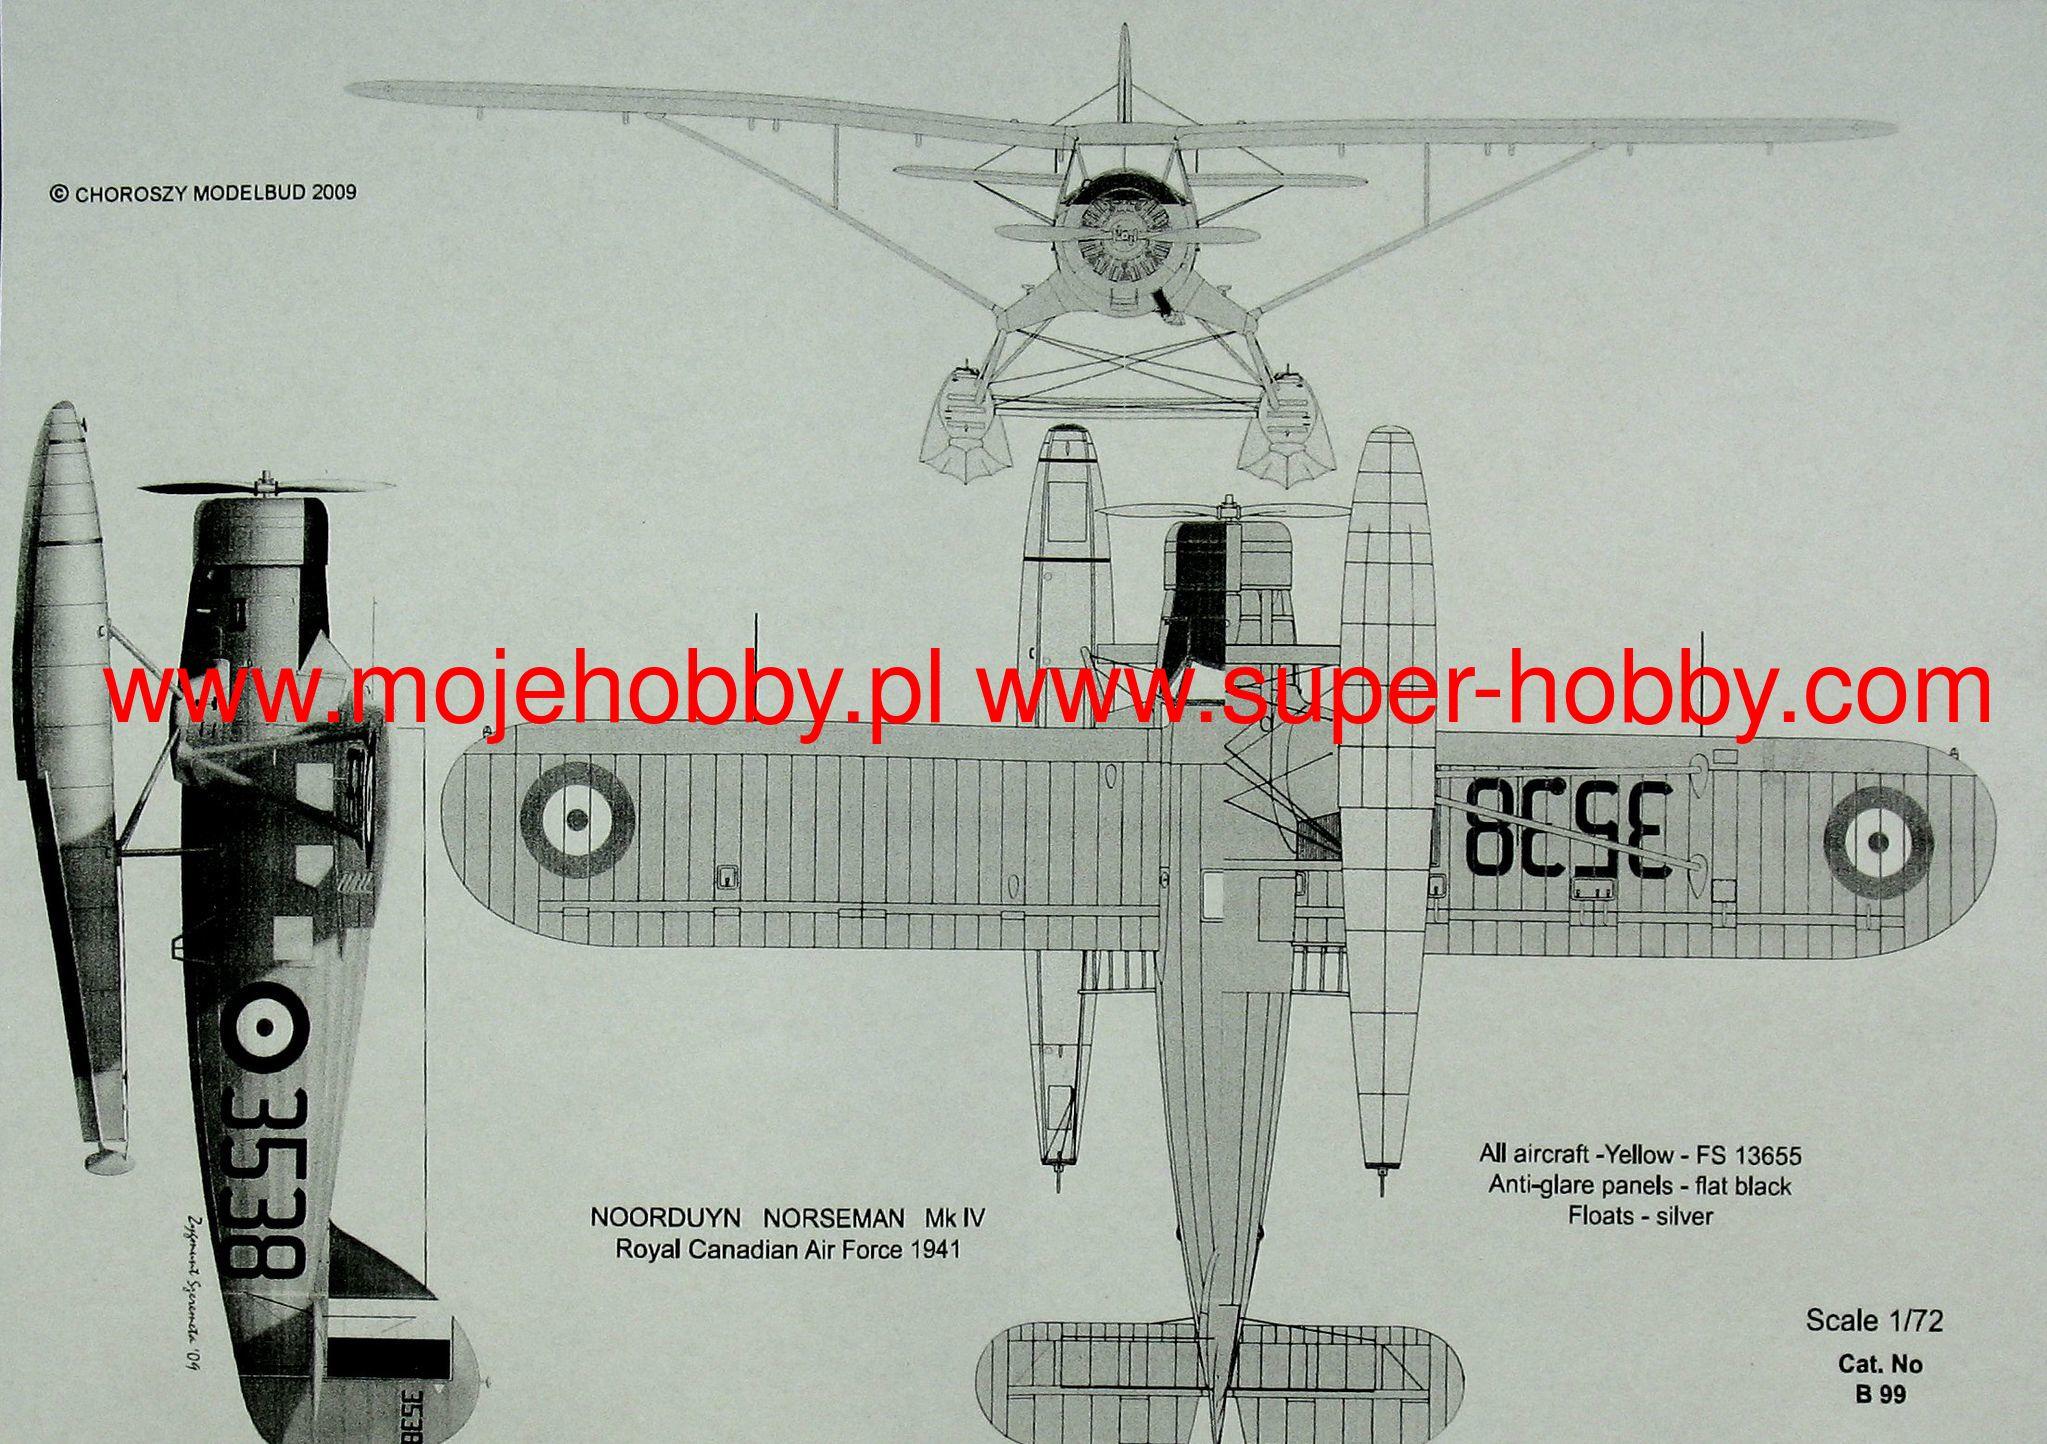 Choroszy 1//72 B98 Noorduyn Norseman Mk.IV resin kit